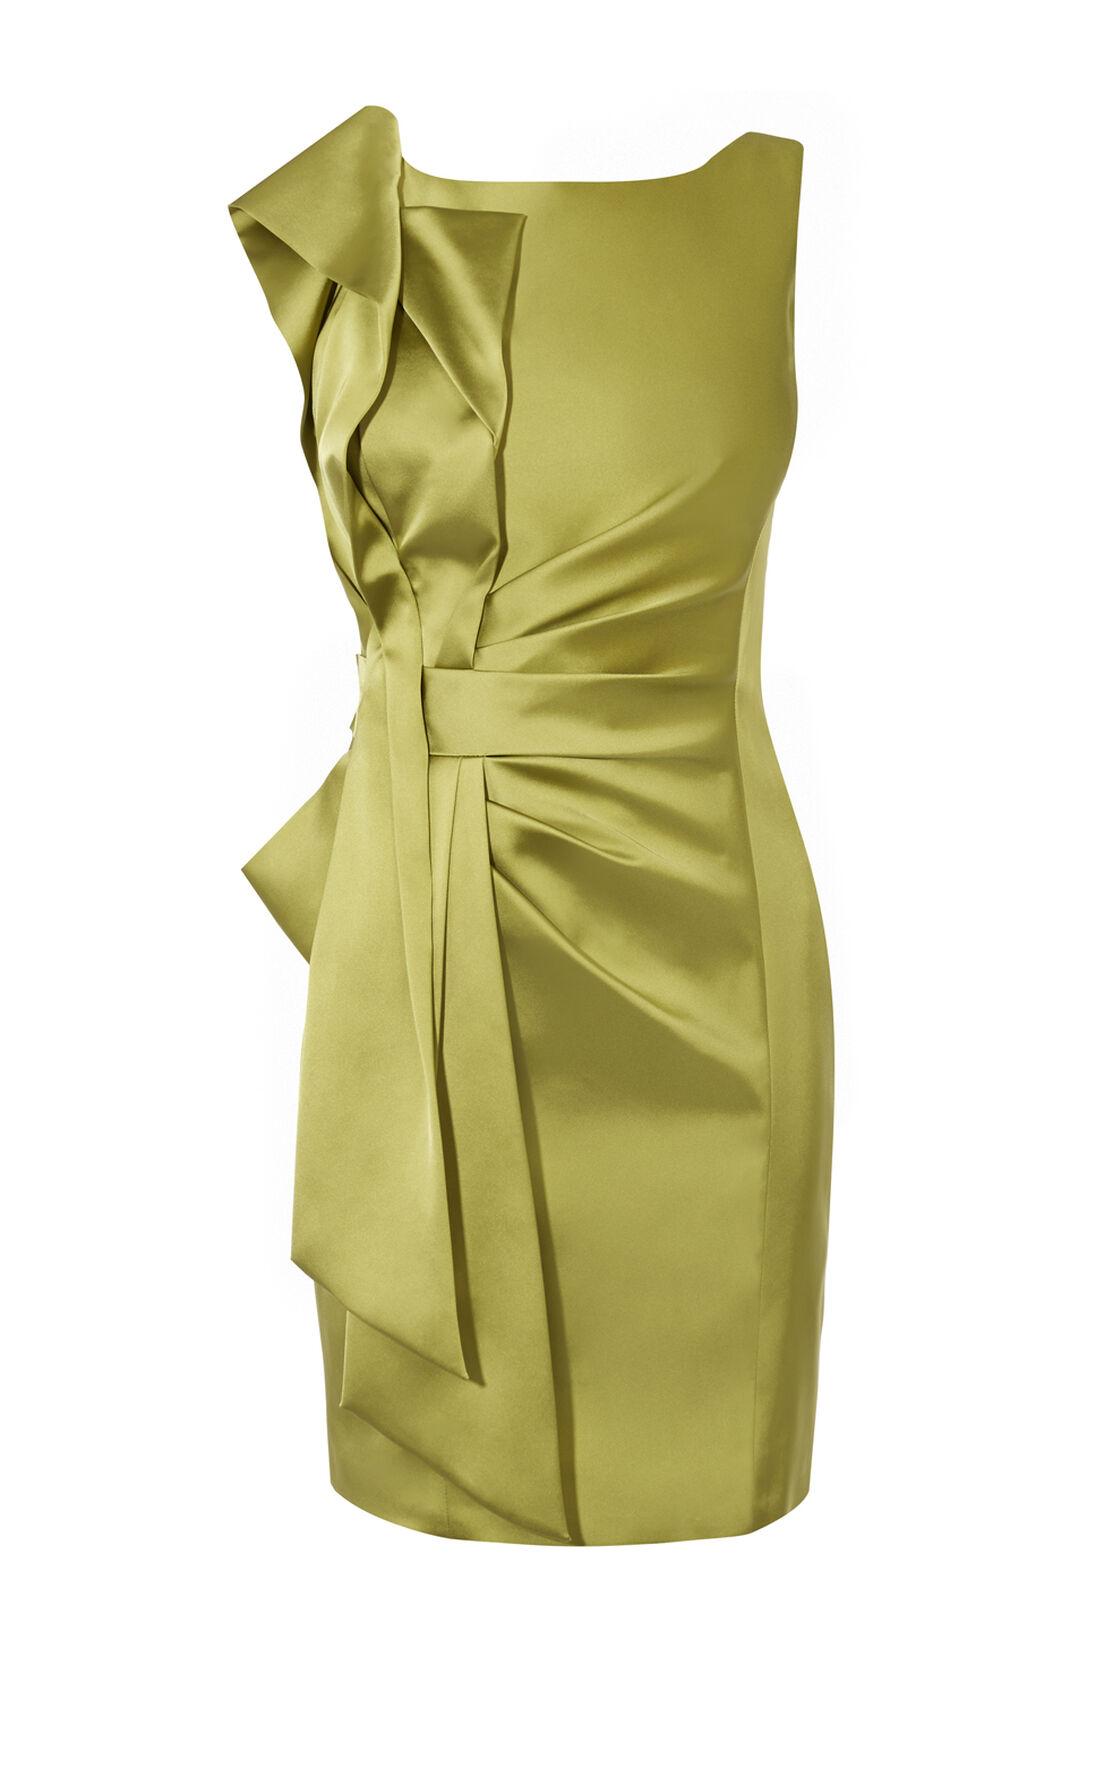 Karen Millen, SATIN PENCIL DRESS Lime 0